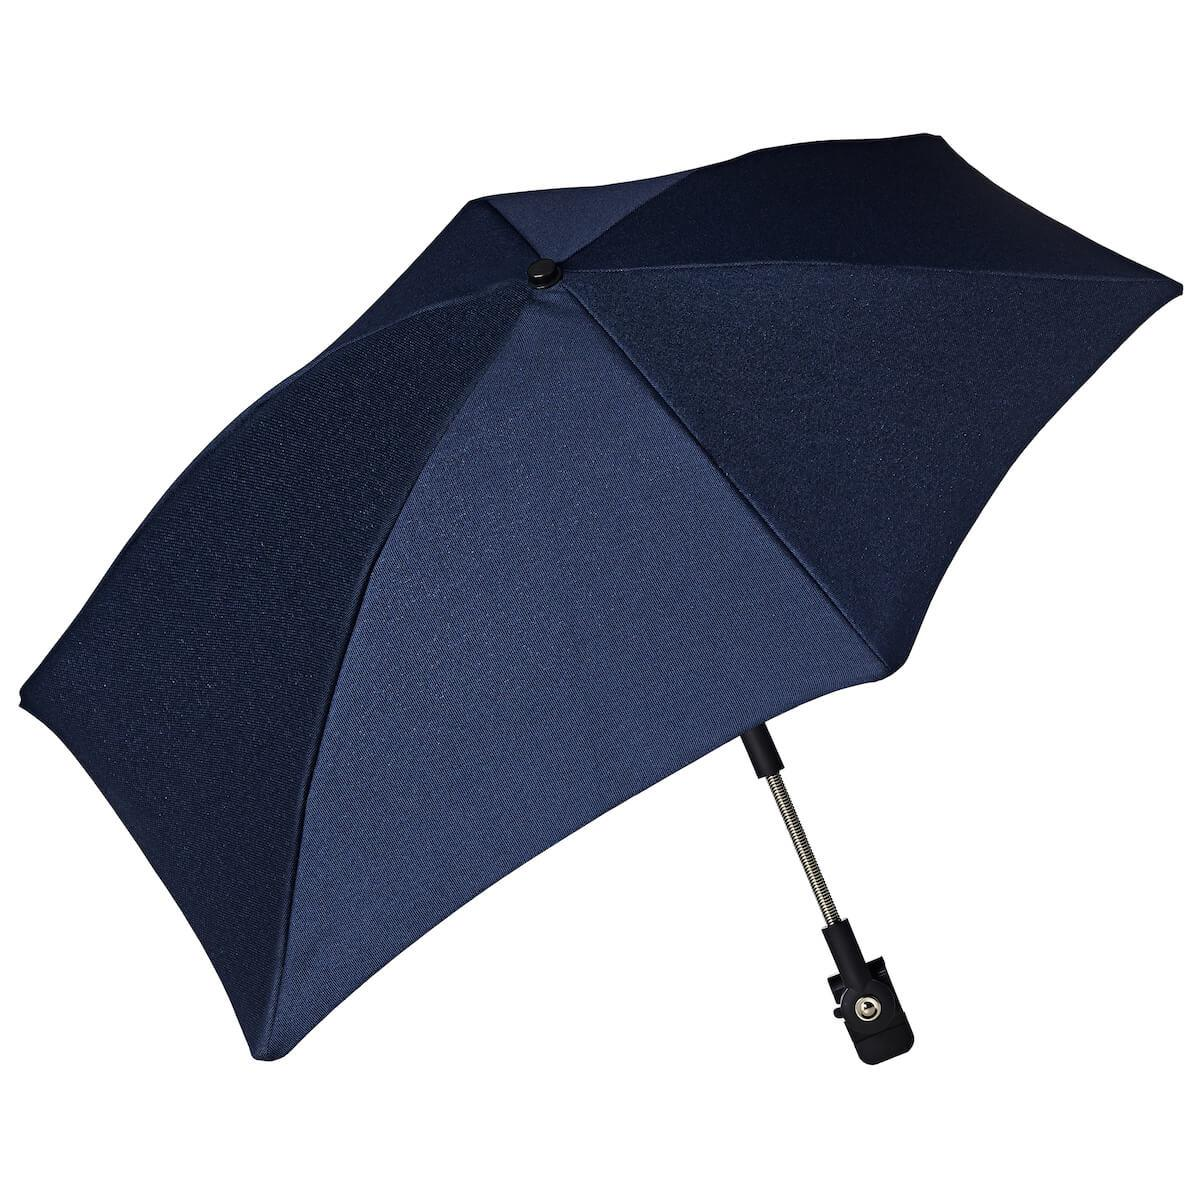 Ombrelle UNI² Joolz Classic blue